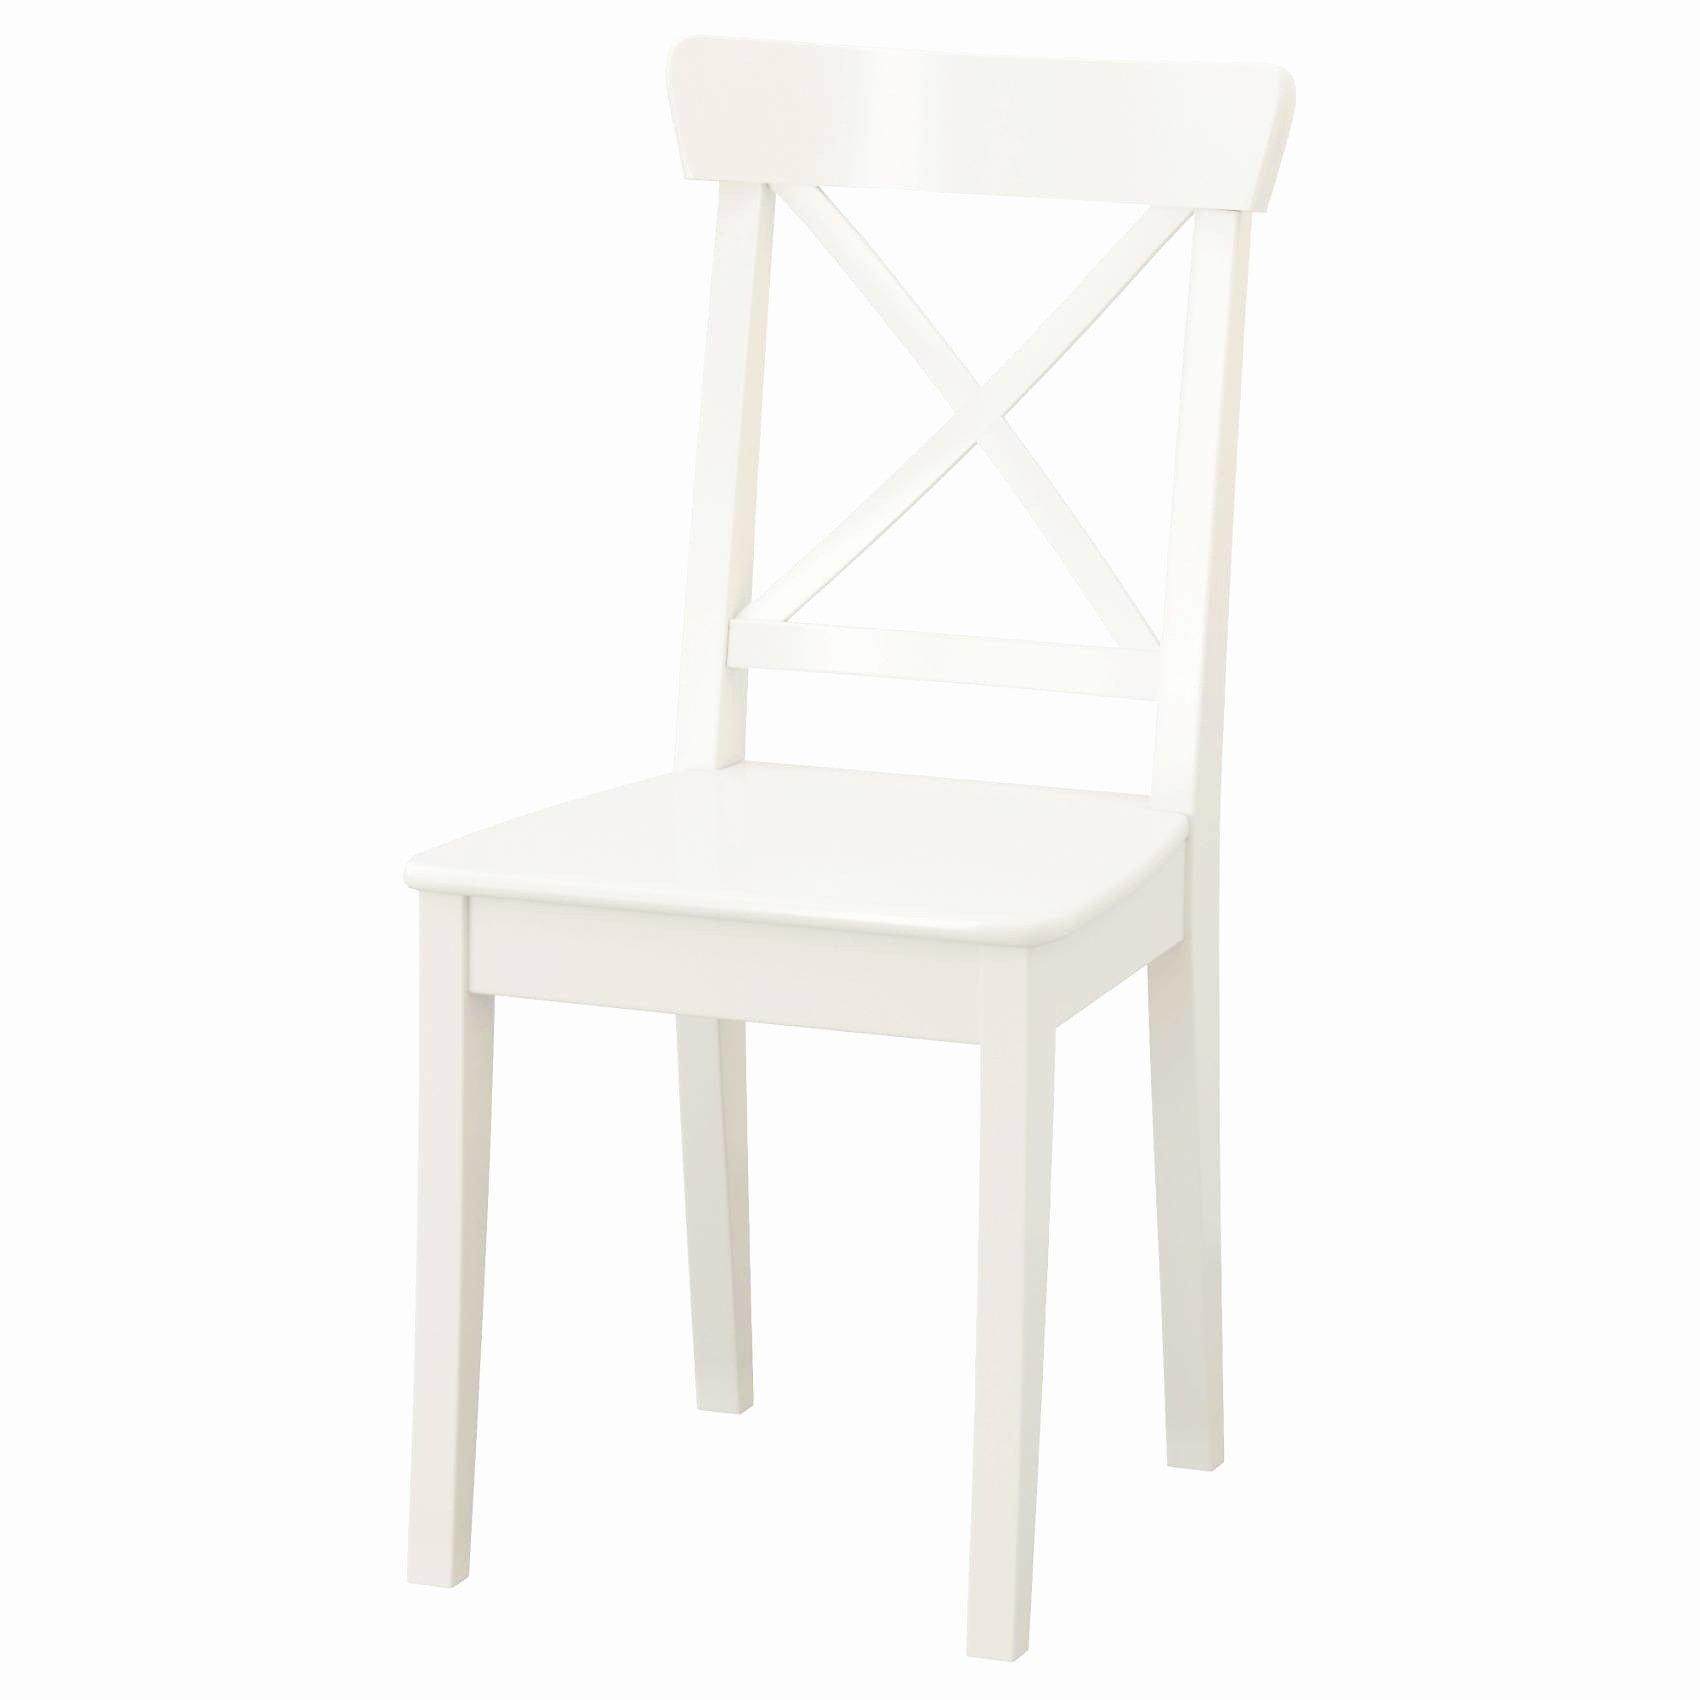 Chaises De Jardin Ikea Inspirant Photos √ Chaise Ikea Blanche Basique Chaise Blanche Unique Chaise Sixties